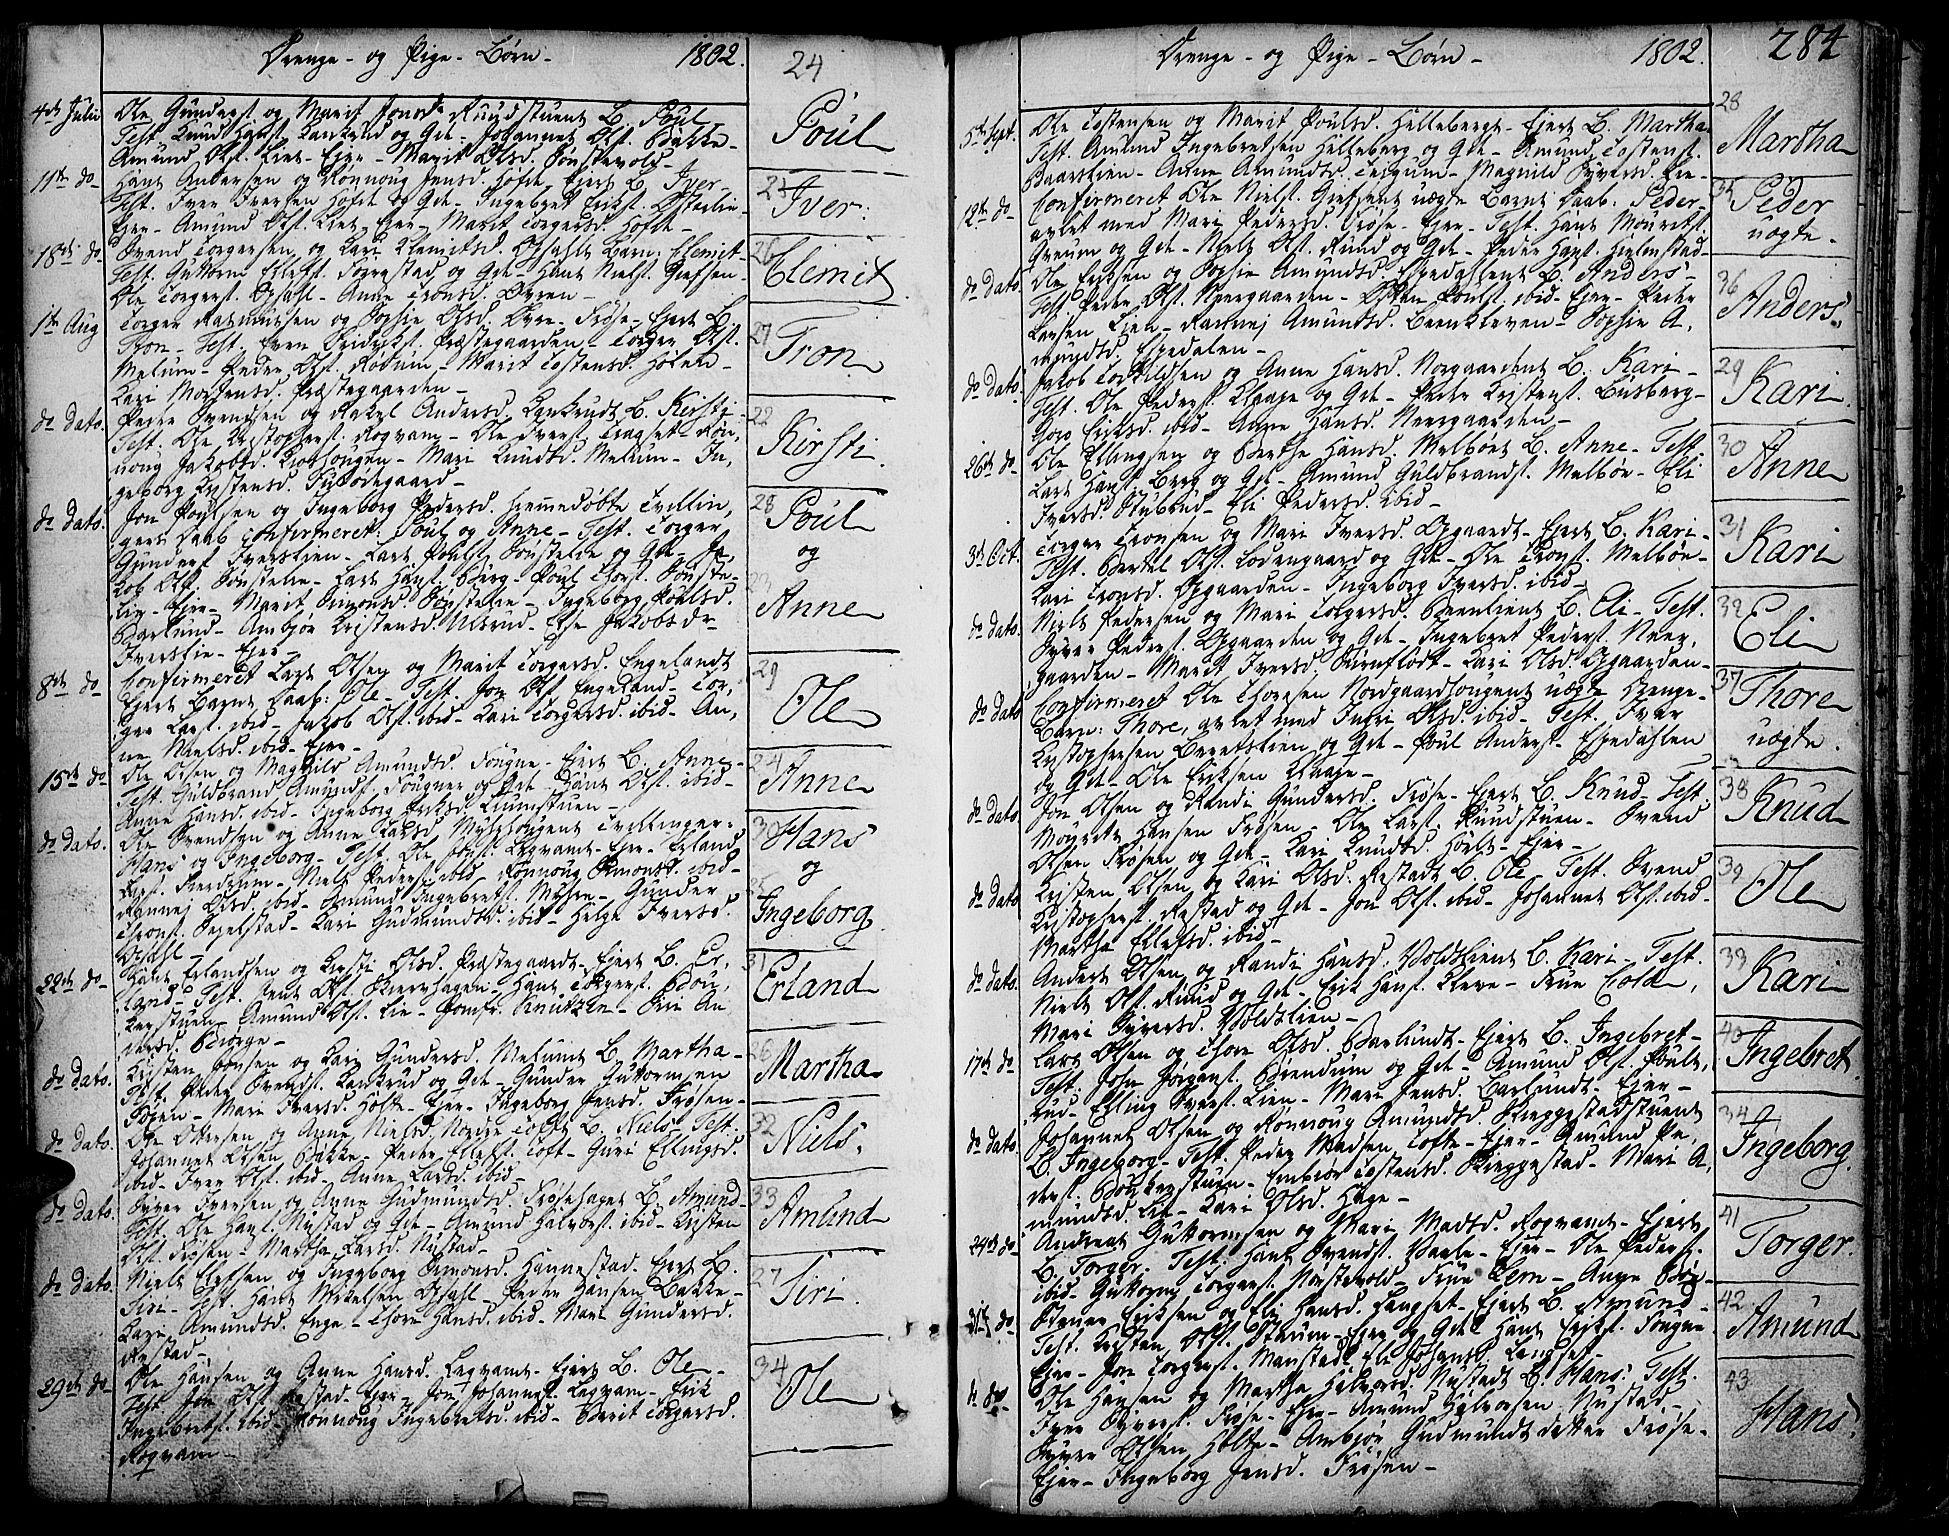 SAH, Gausdal prestekontor, Ministerialbok nr. 3, 1758-1809, s. 284